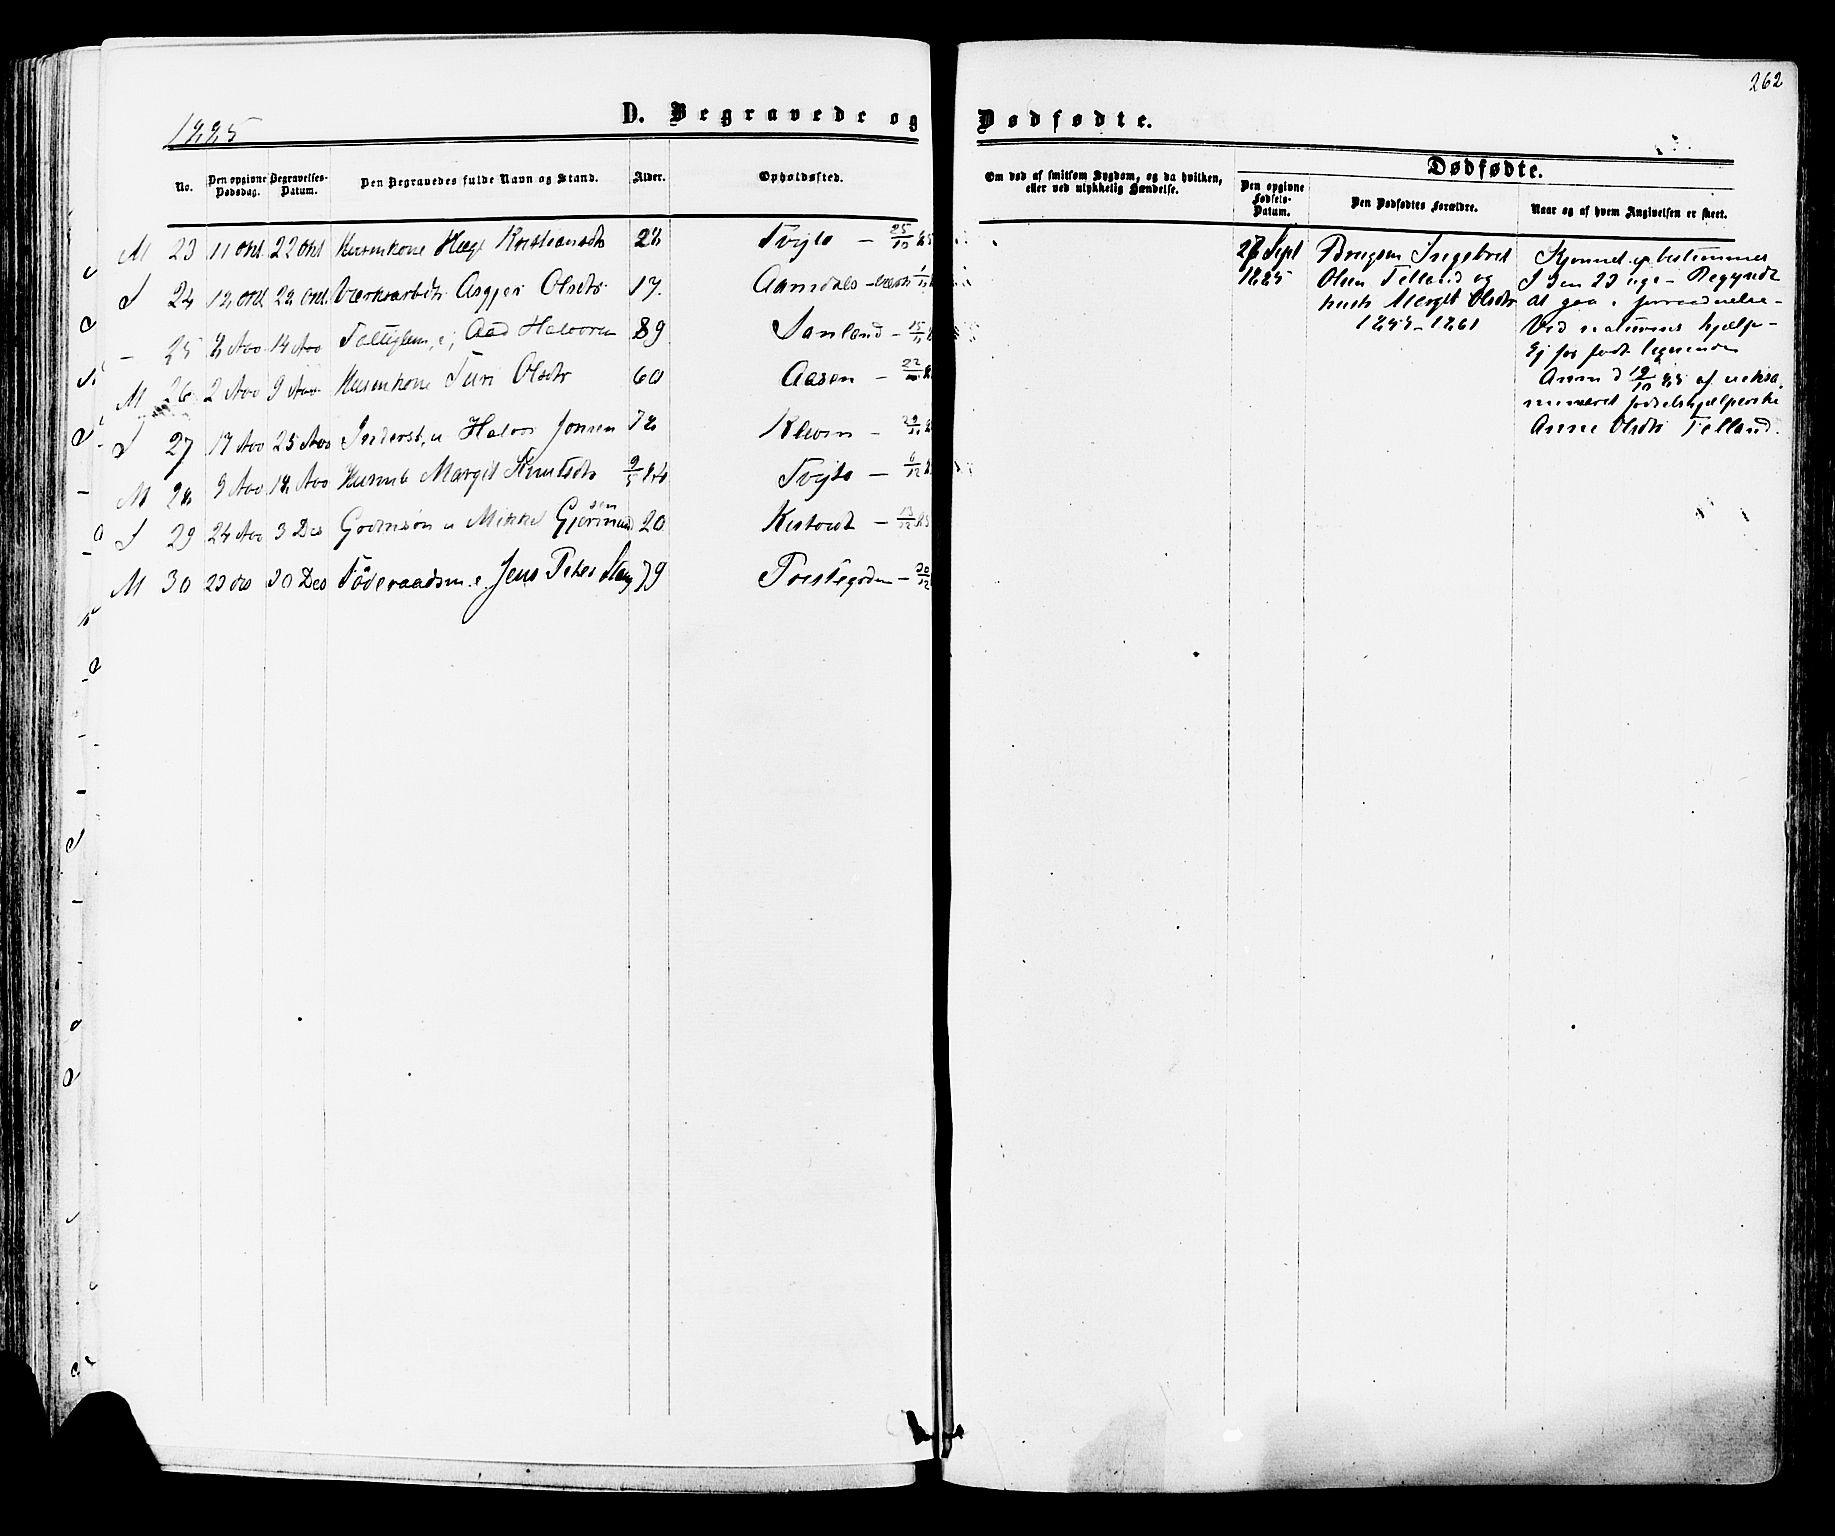 SAKO, Mo kirkebøker, F/Fa/L0006: Parish register (official) no. I 6, 1865-1885, p. 262